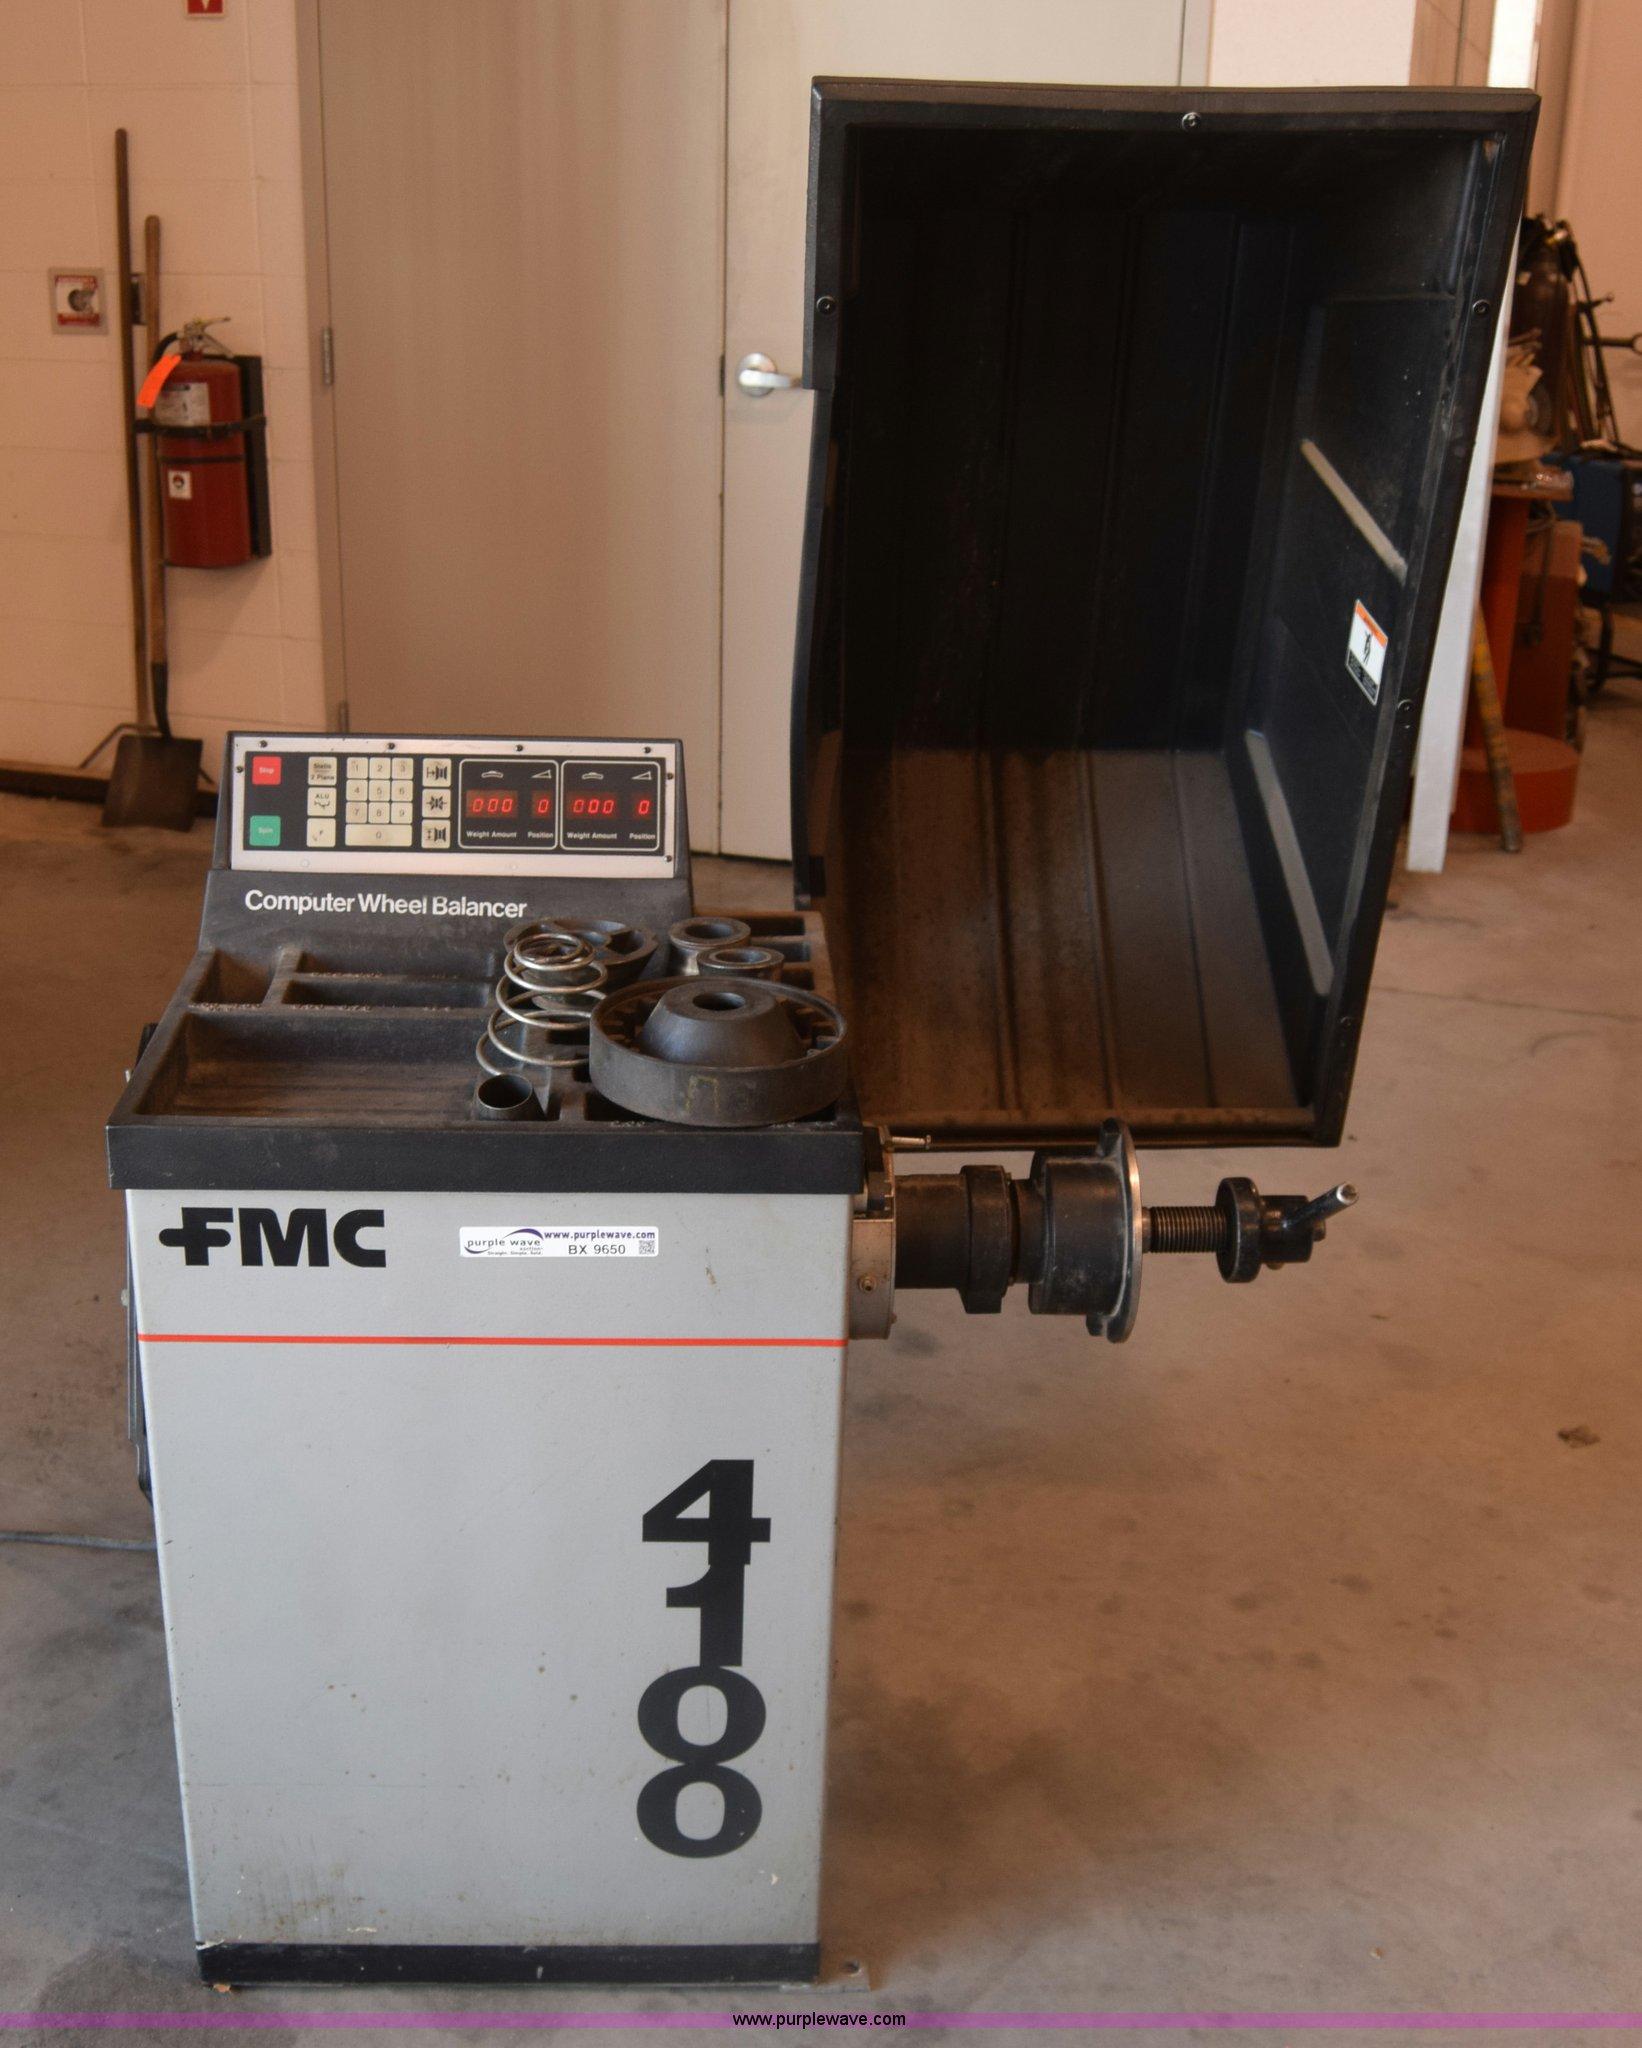 BX9650 image for item BX9650 FMC 4100 tire balancer